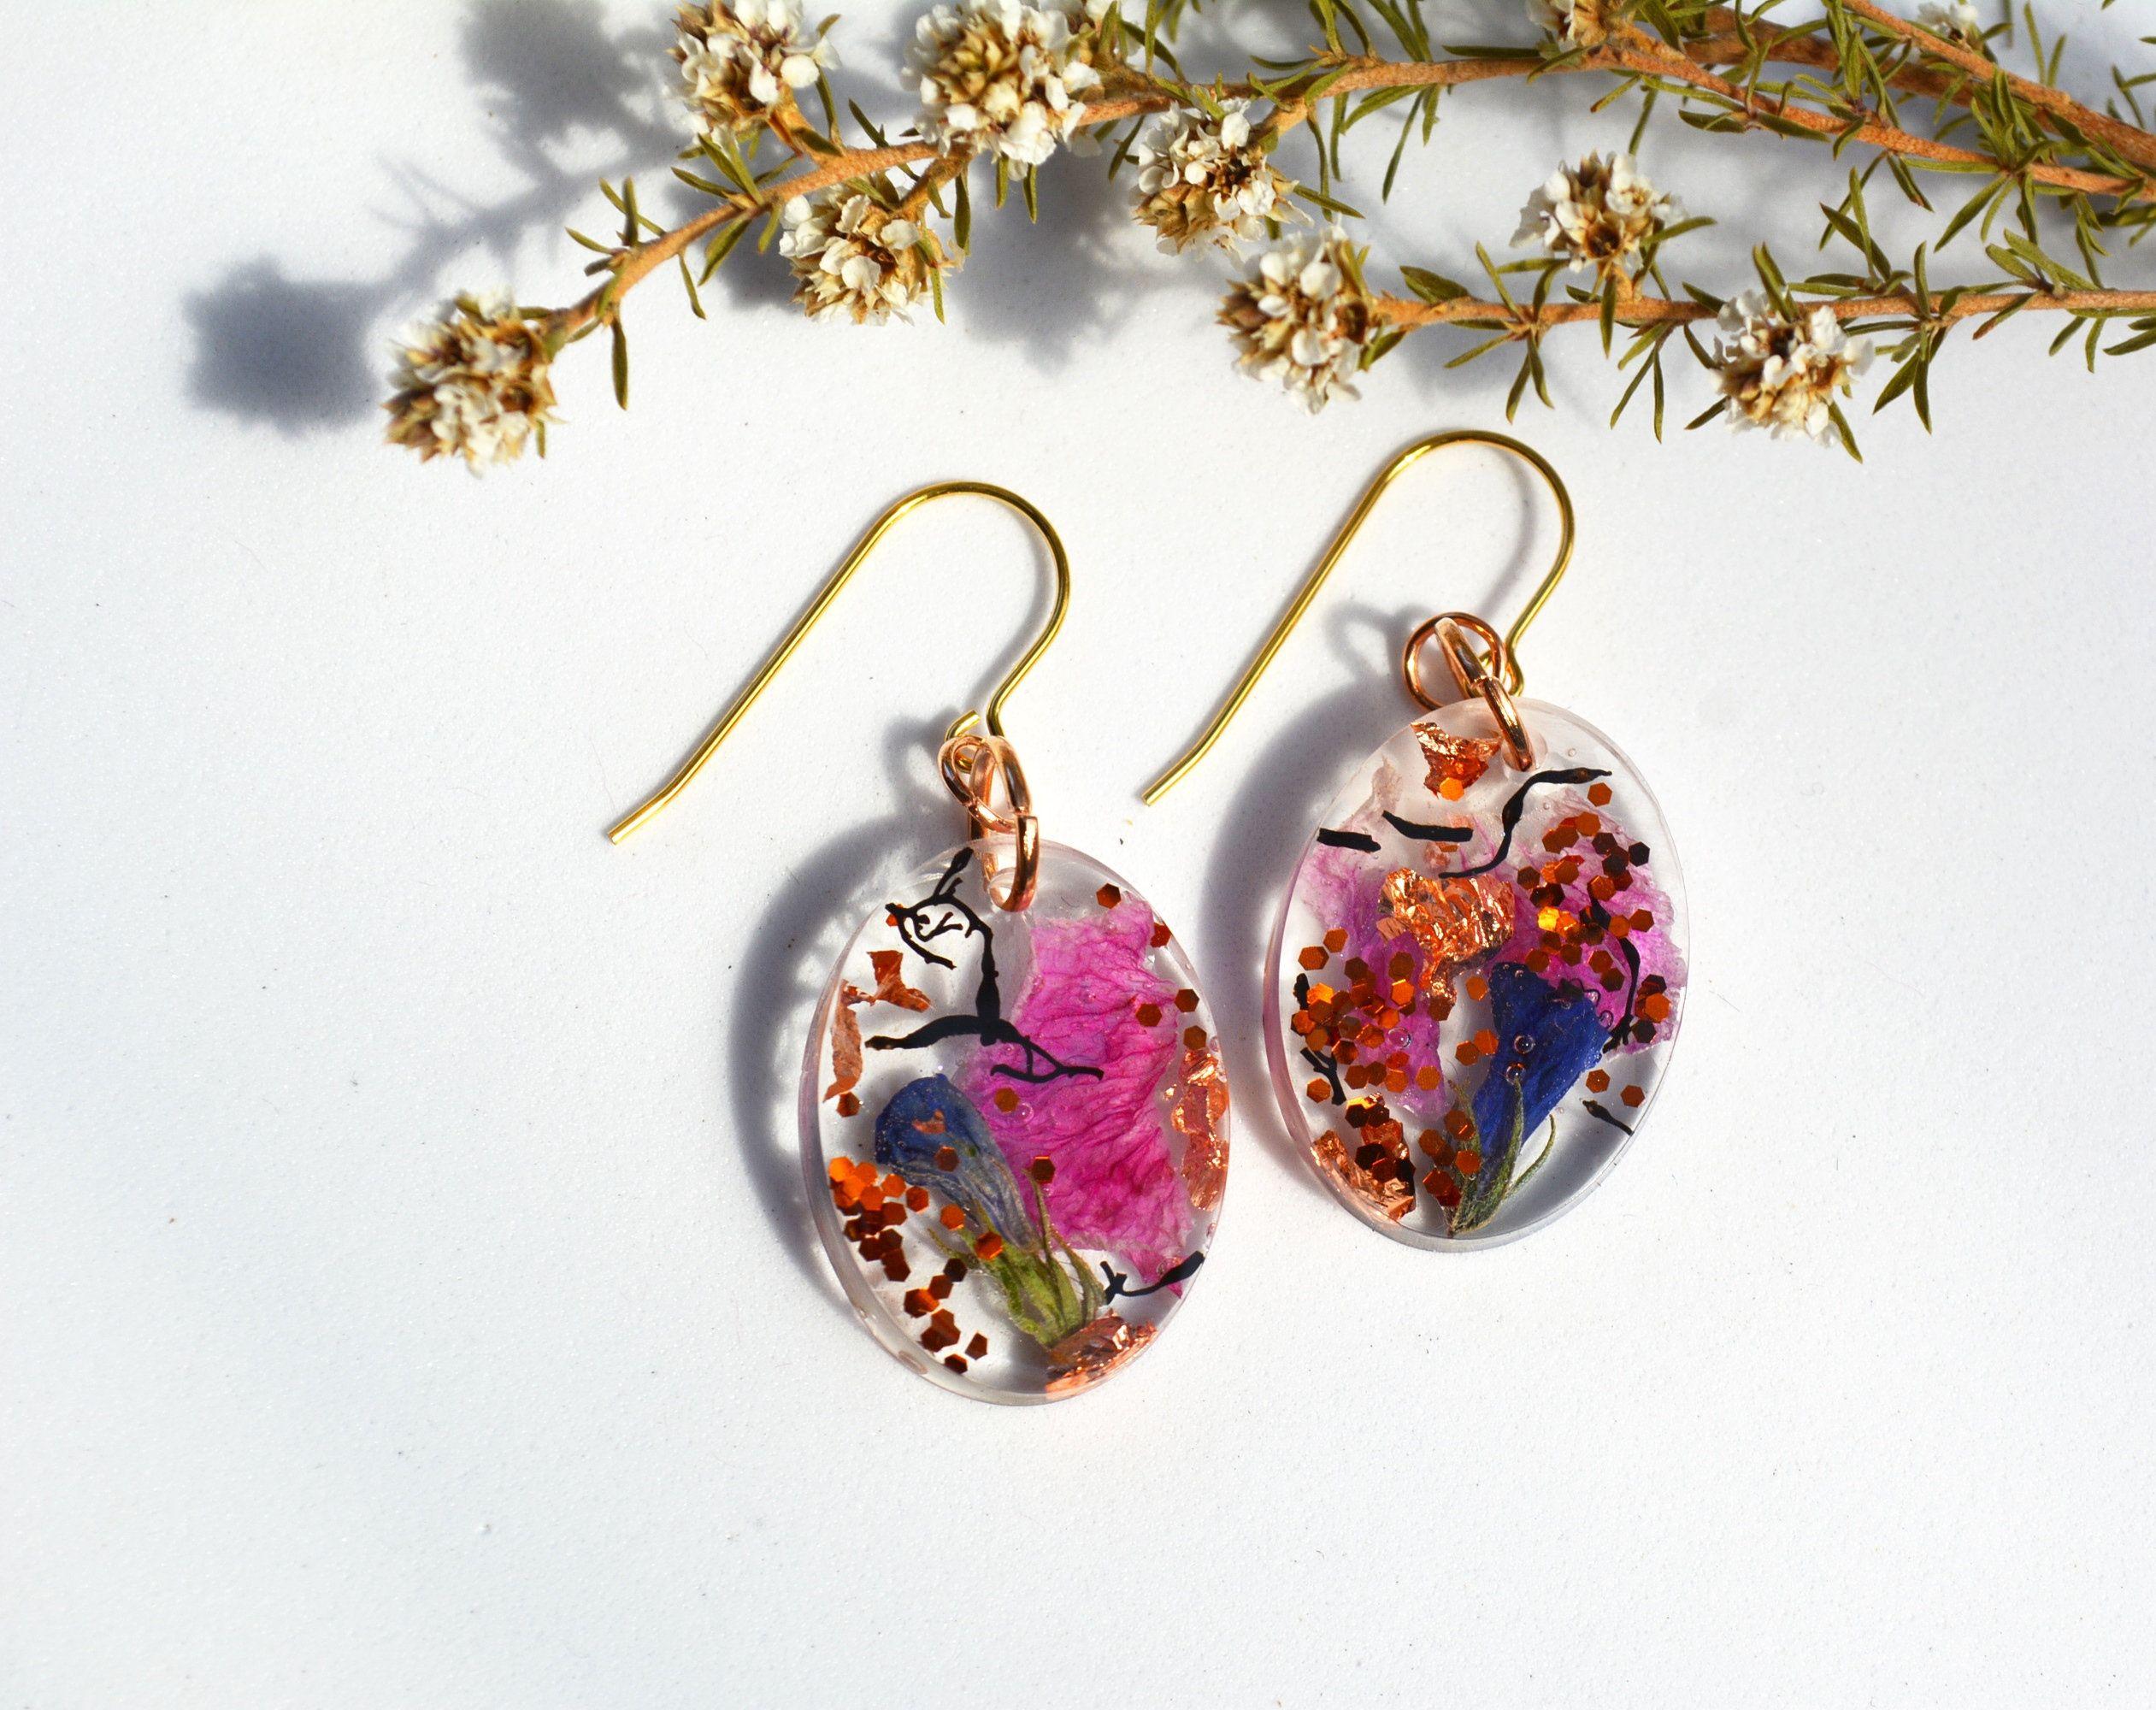 2ee661b265d04b Real Flower Resin Jewelry, Pressed Flower earrings, Resin Earrings, Flower  Petal Dangles, Oval Earrings, Botanical Earrings, Nature Gift